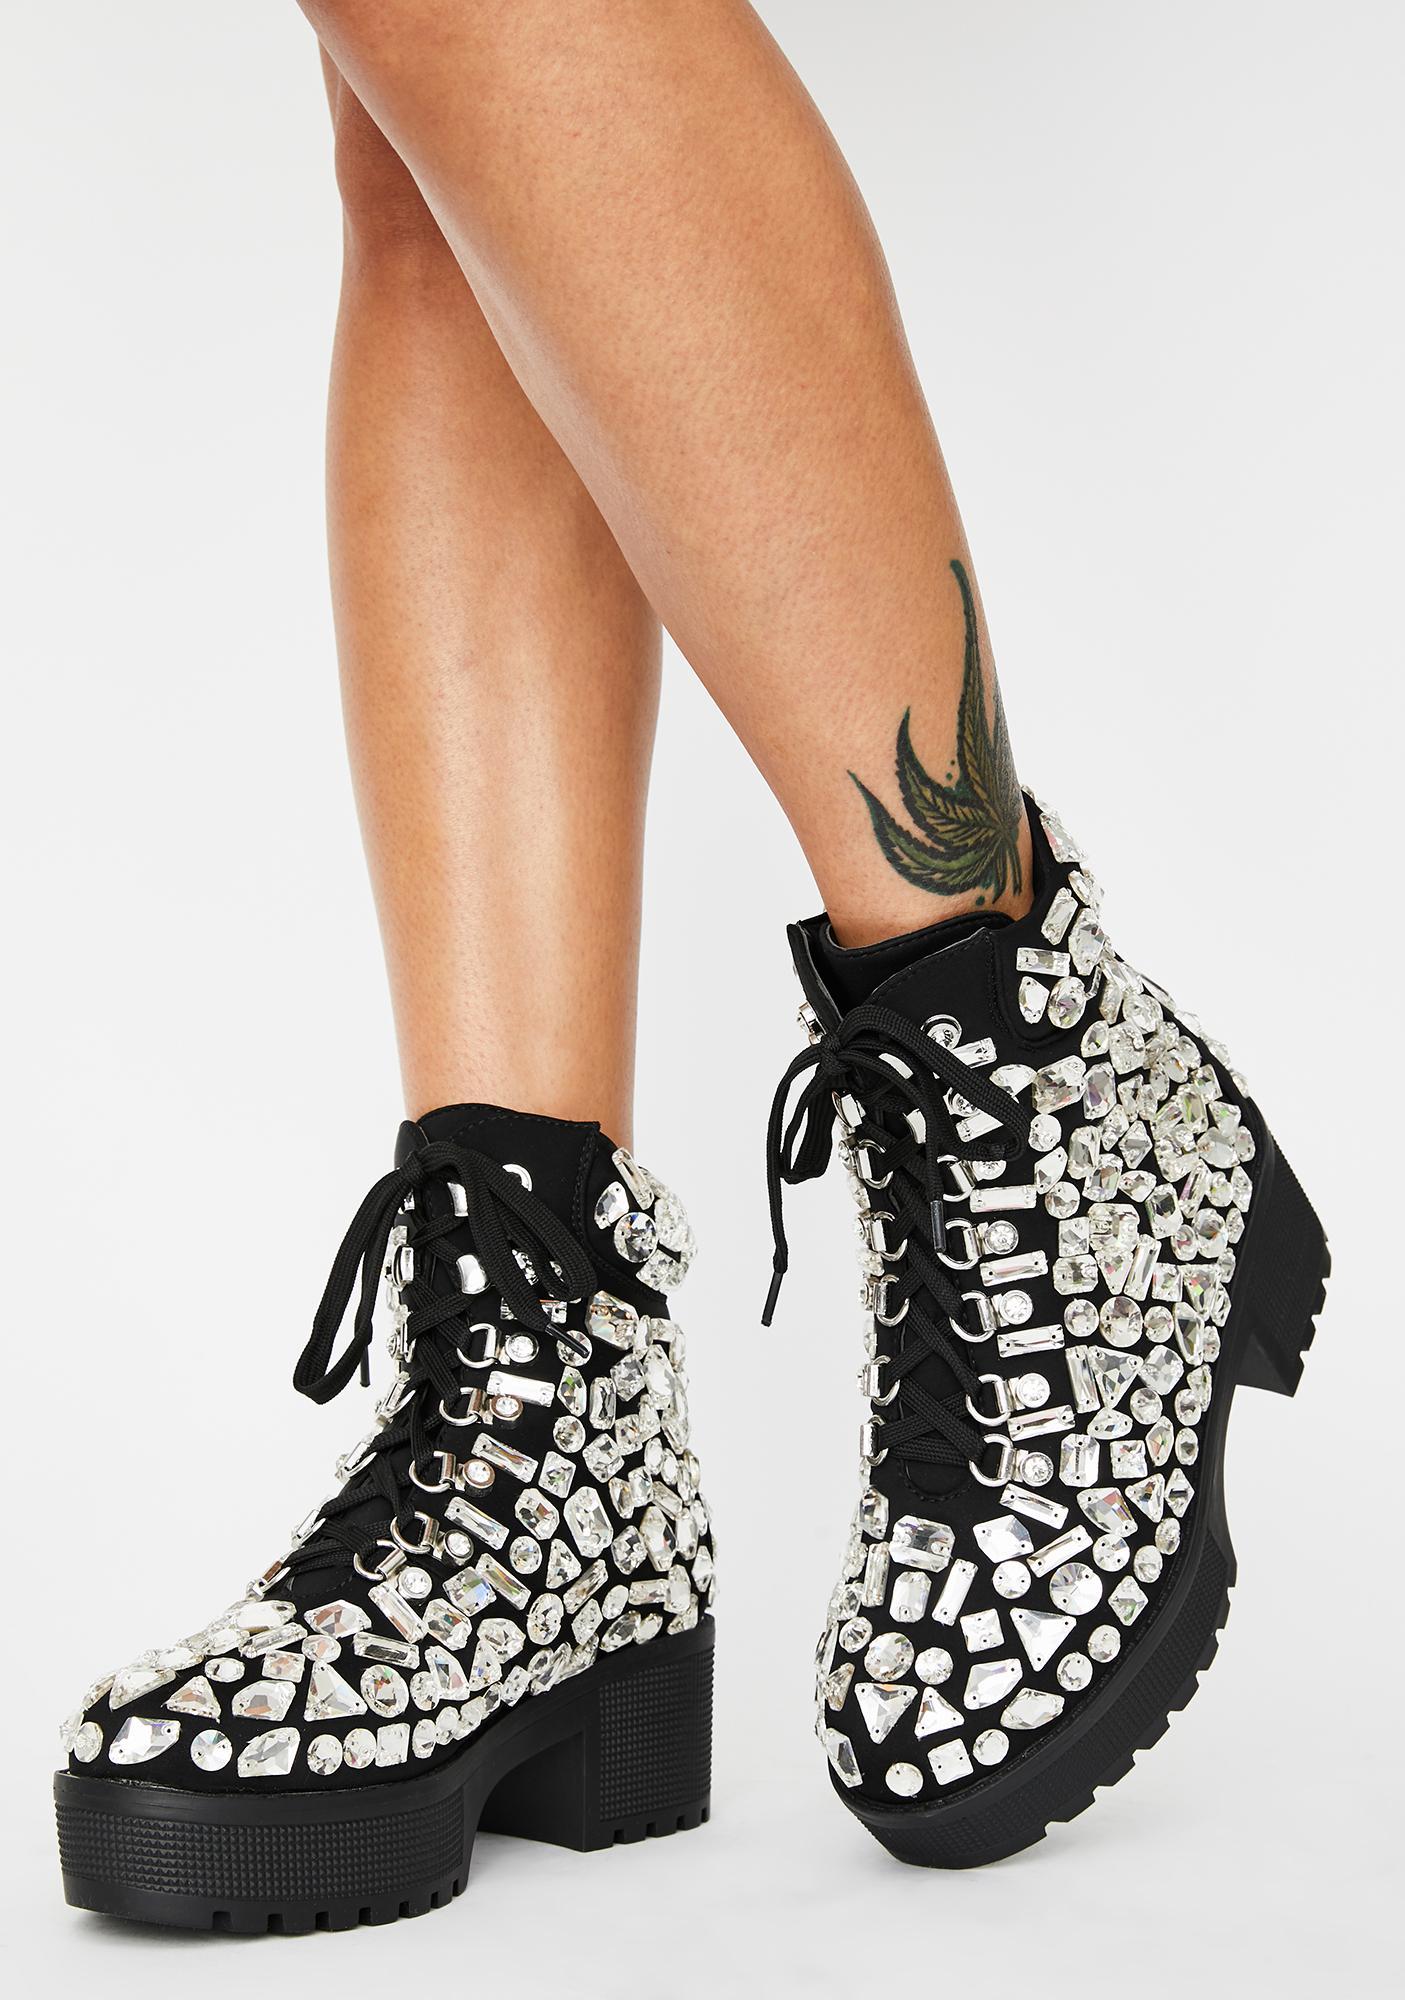 AZALEA WANG York Rhinestone Boots